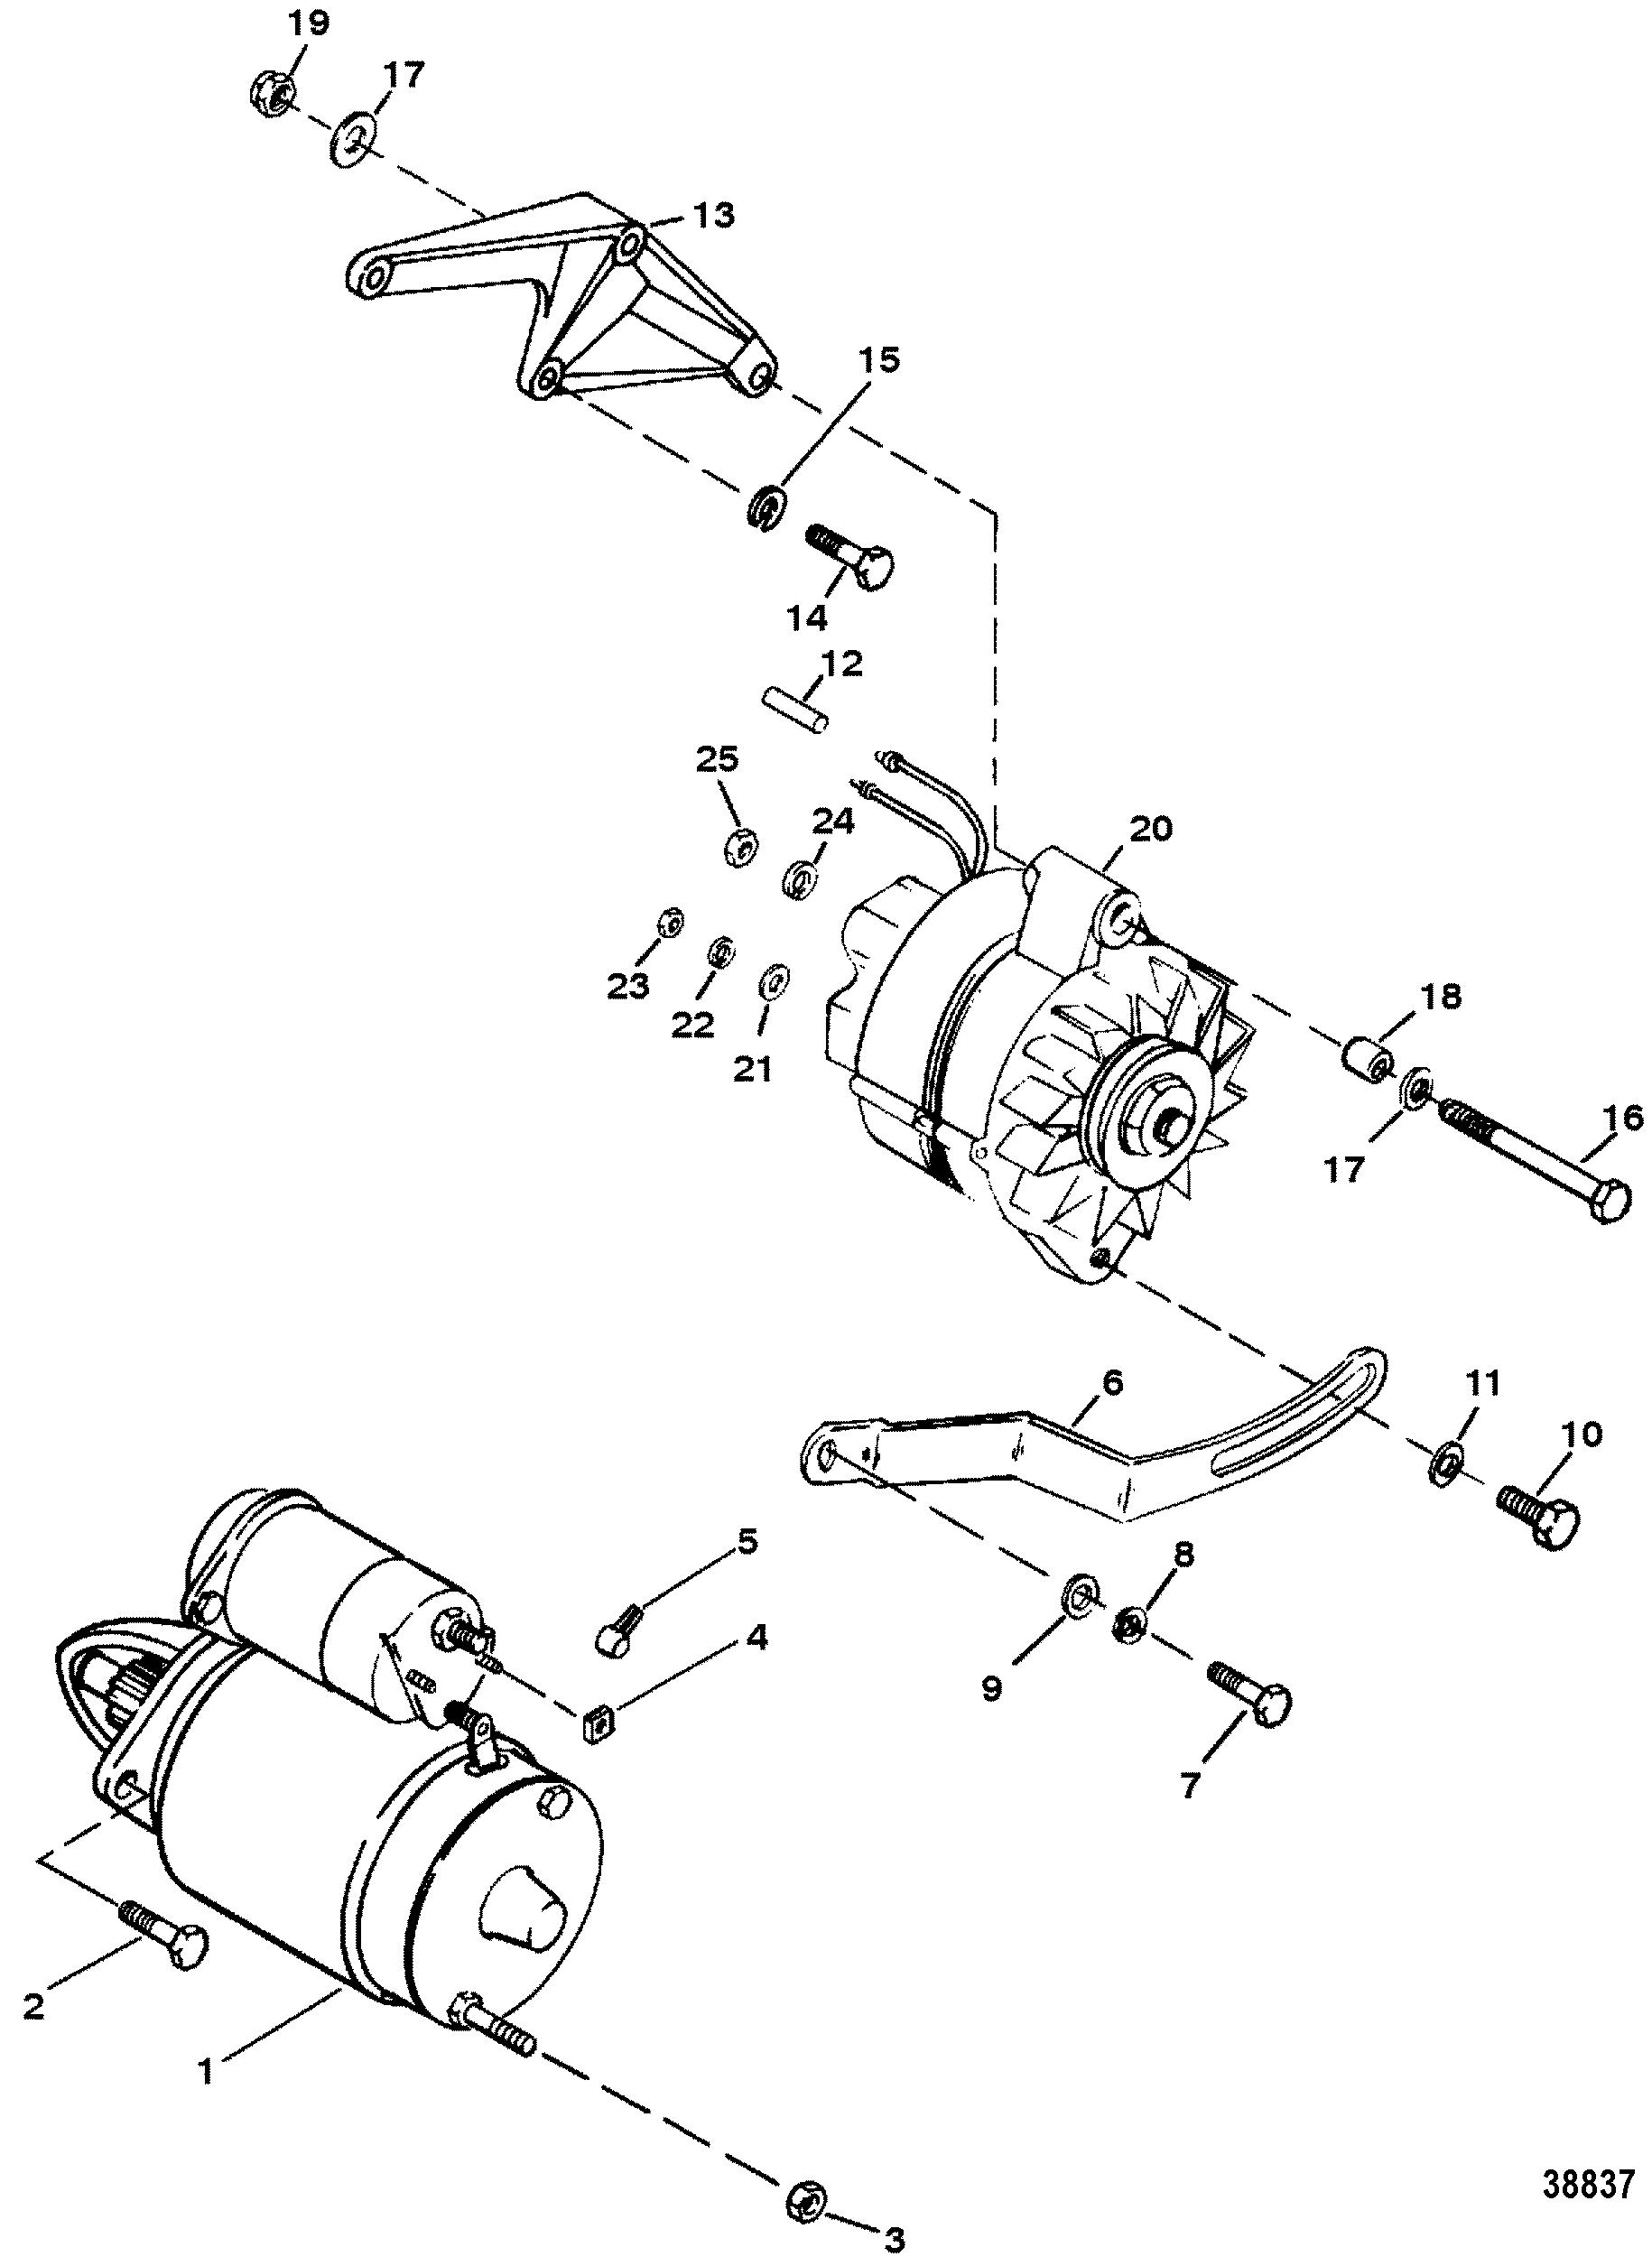 DIAGRAM] Marine 454 Starter Alternator Wiring Diagram FULL Version HD  Quality Wiring Diagram - CORONADELVISTA.DATAJOB2013.FRcoronadelvista.datajob2013.fr